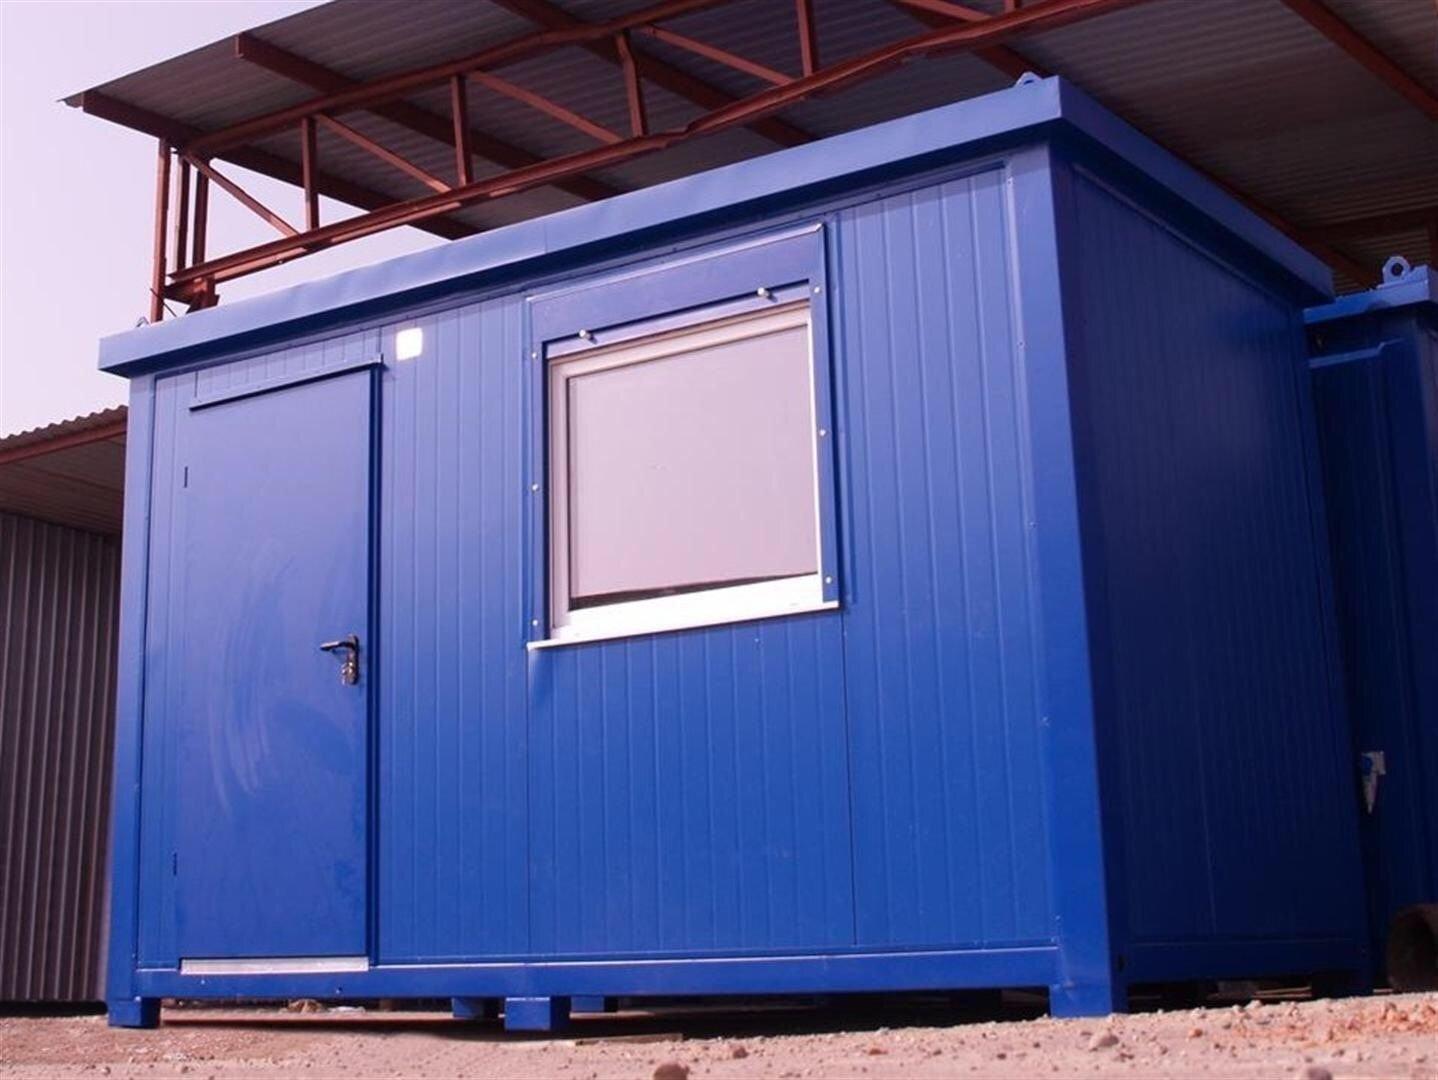 b rocontainer 4 00m x 2 00m mit jalousie containerhandel 24. Black Bedroom Furniture Sets. Home Design Ideas